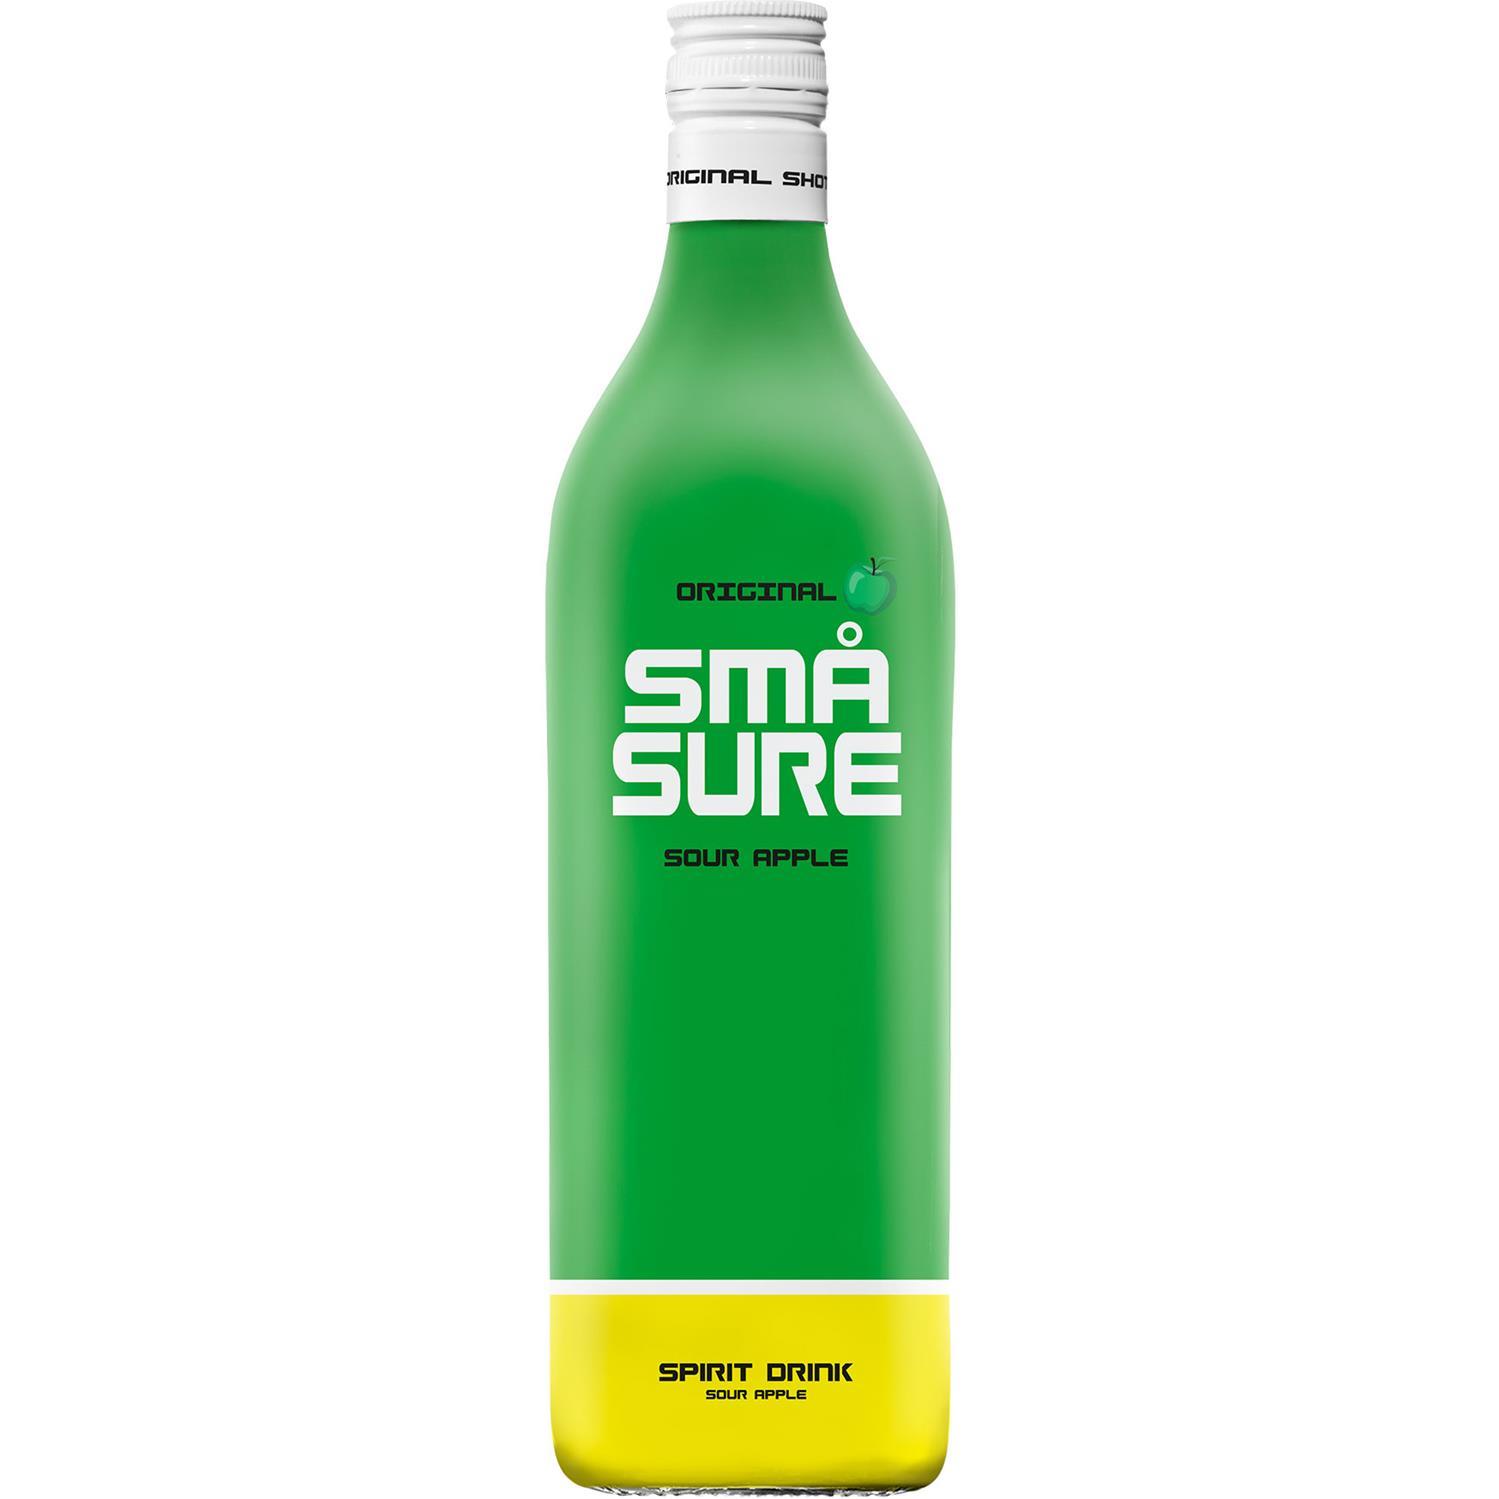 Fabriksnye Små Sure 16,4% - Små sure shots - Køb her AN-21